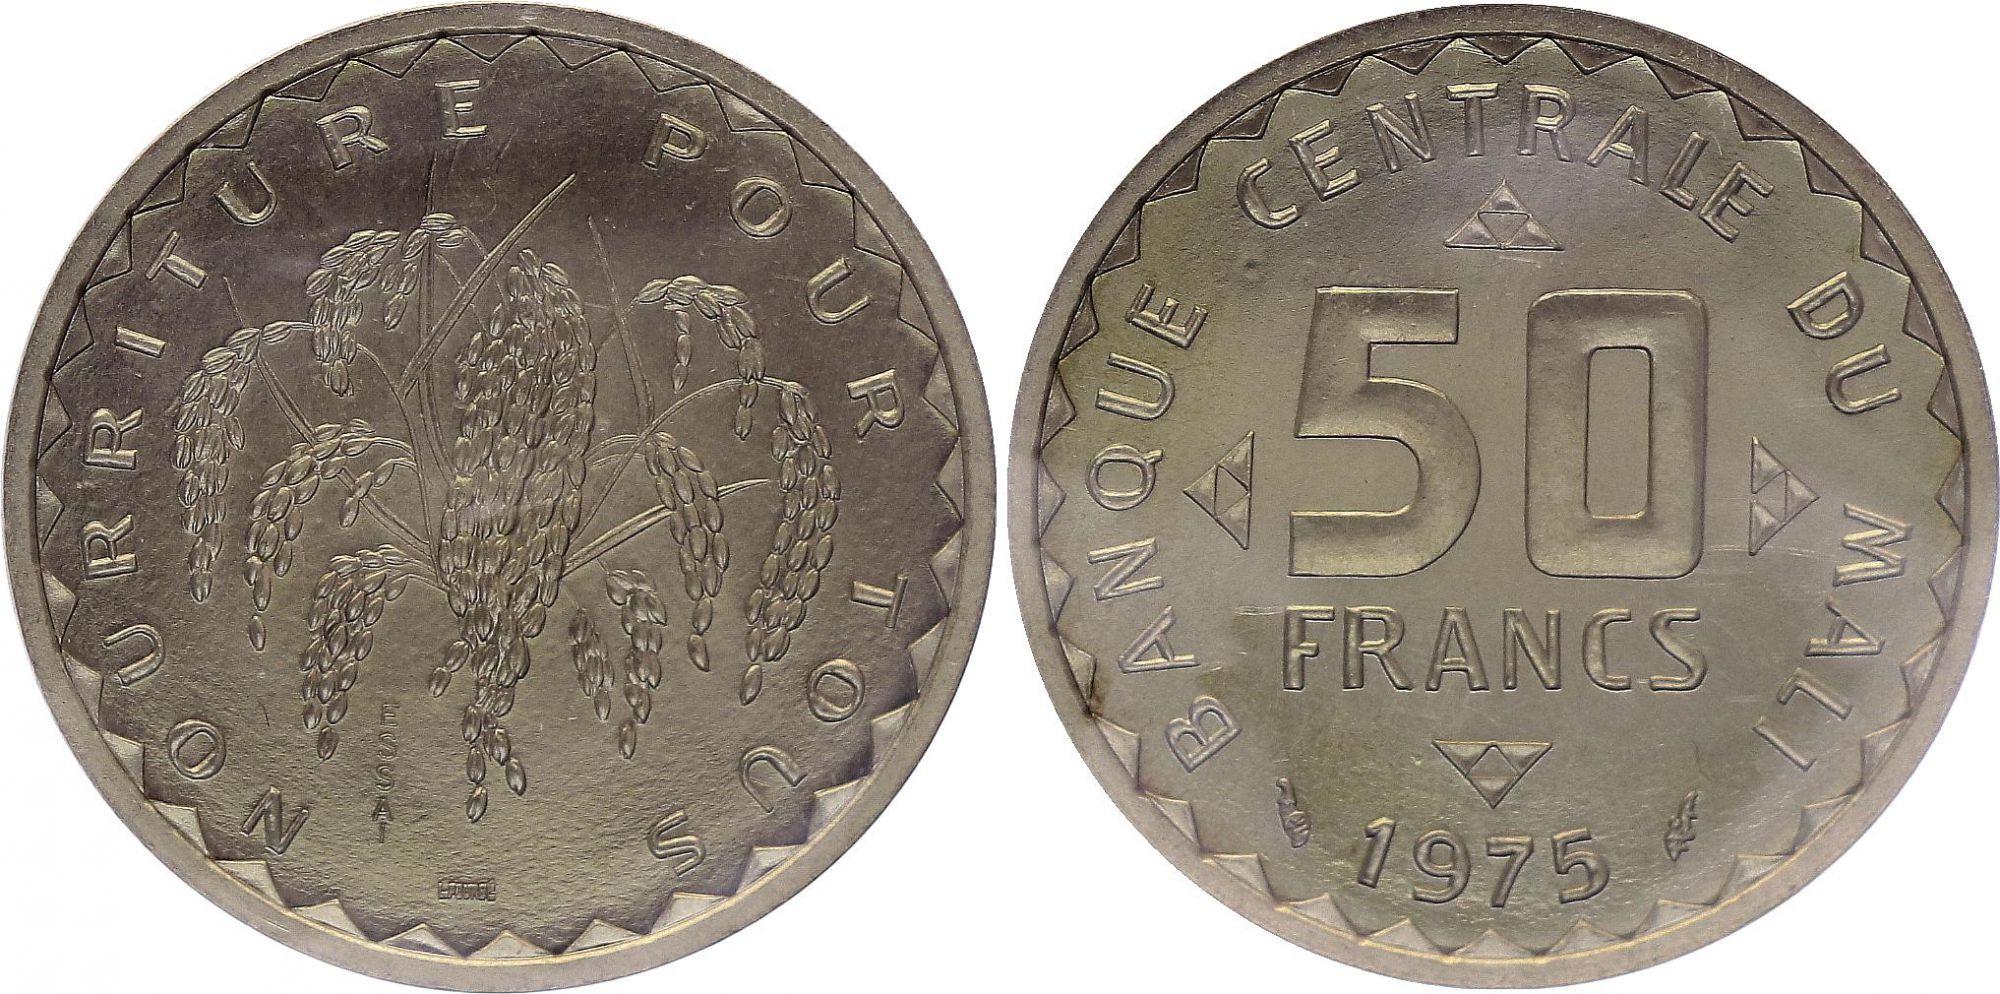 Mali 50 Francs - 1975 - Test strike - Central Bank of Mali